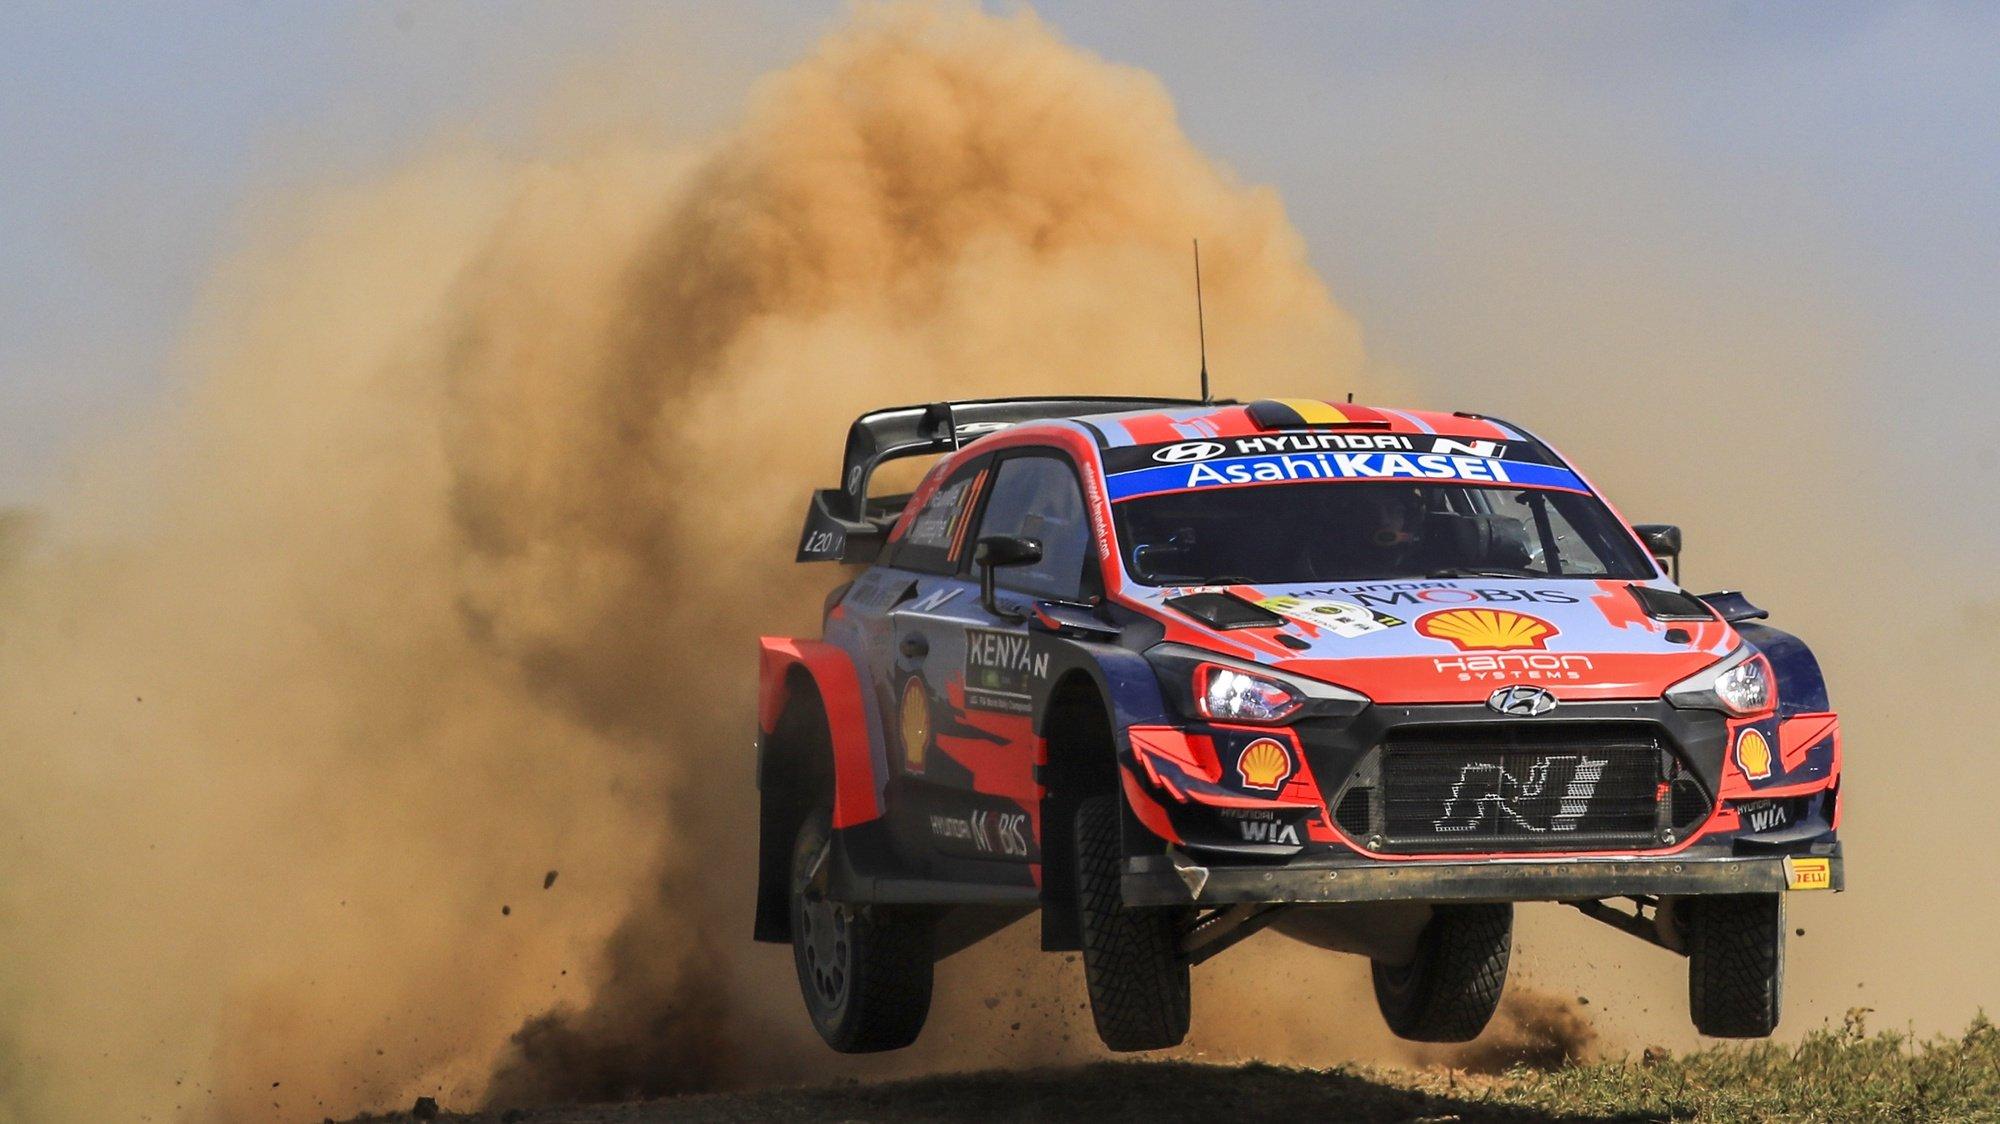 epa09296952 Thierry Neuville of Belgium drives his HYUNDAI i20 Coupe WRC during the shakedown of the Safari Rally Kenya 2021, Nairobi, Kenya, 23 June 2021.  EPA/Reporter Images